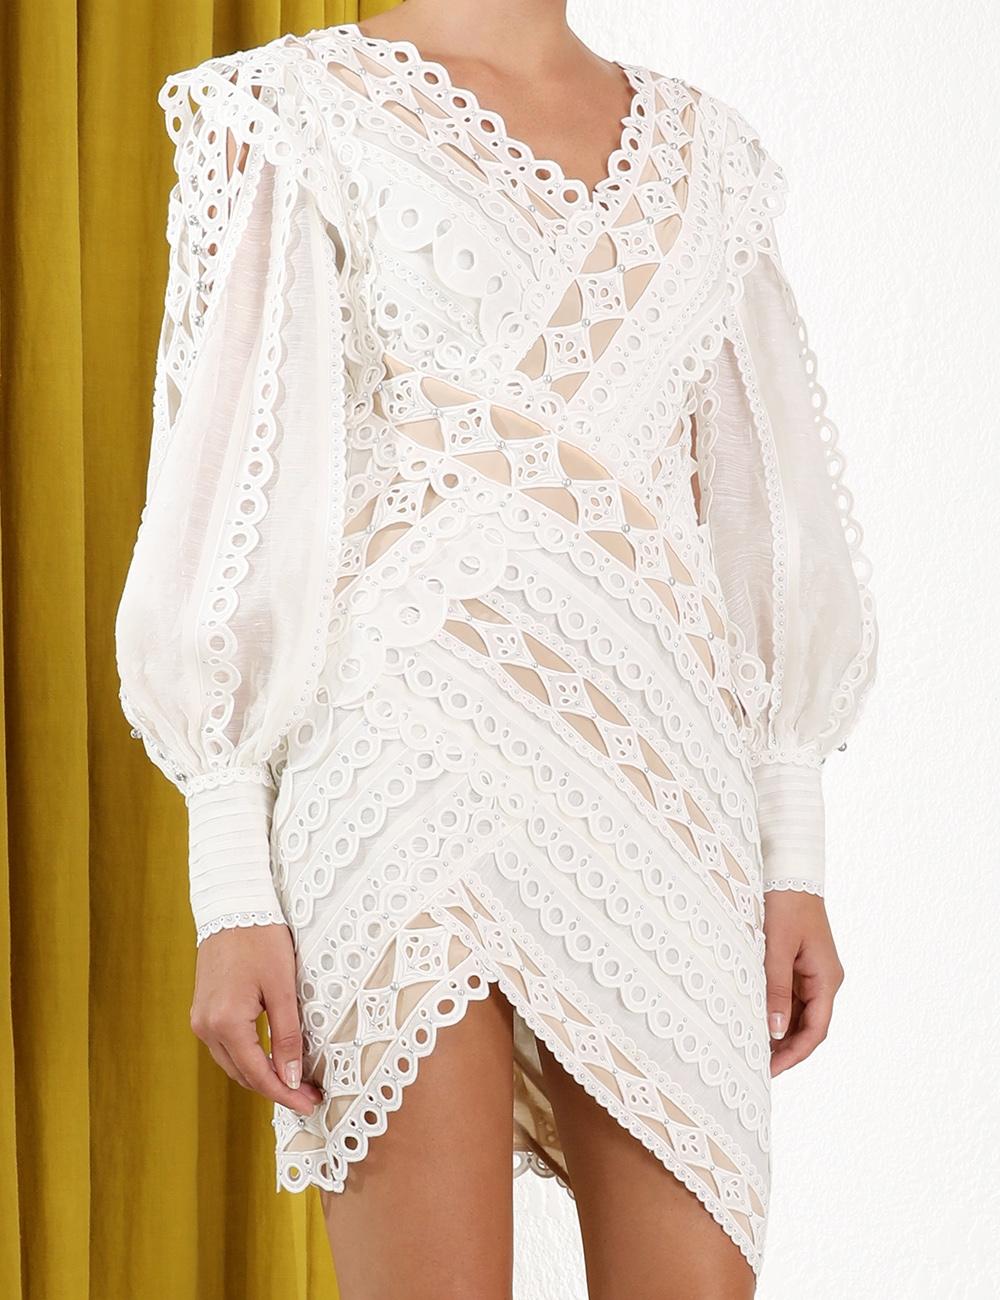 Moncur Studded Mini Dress